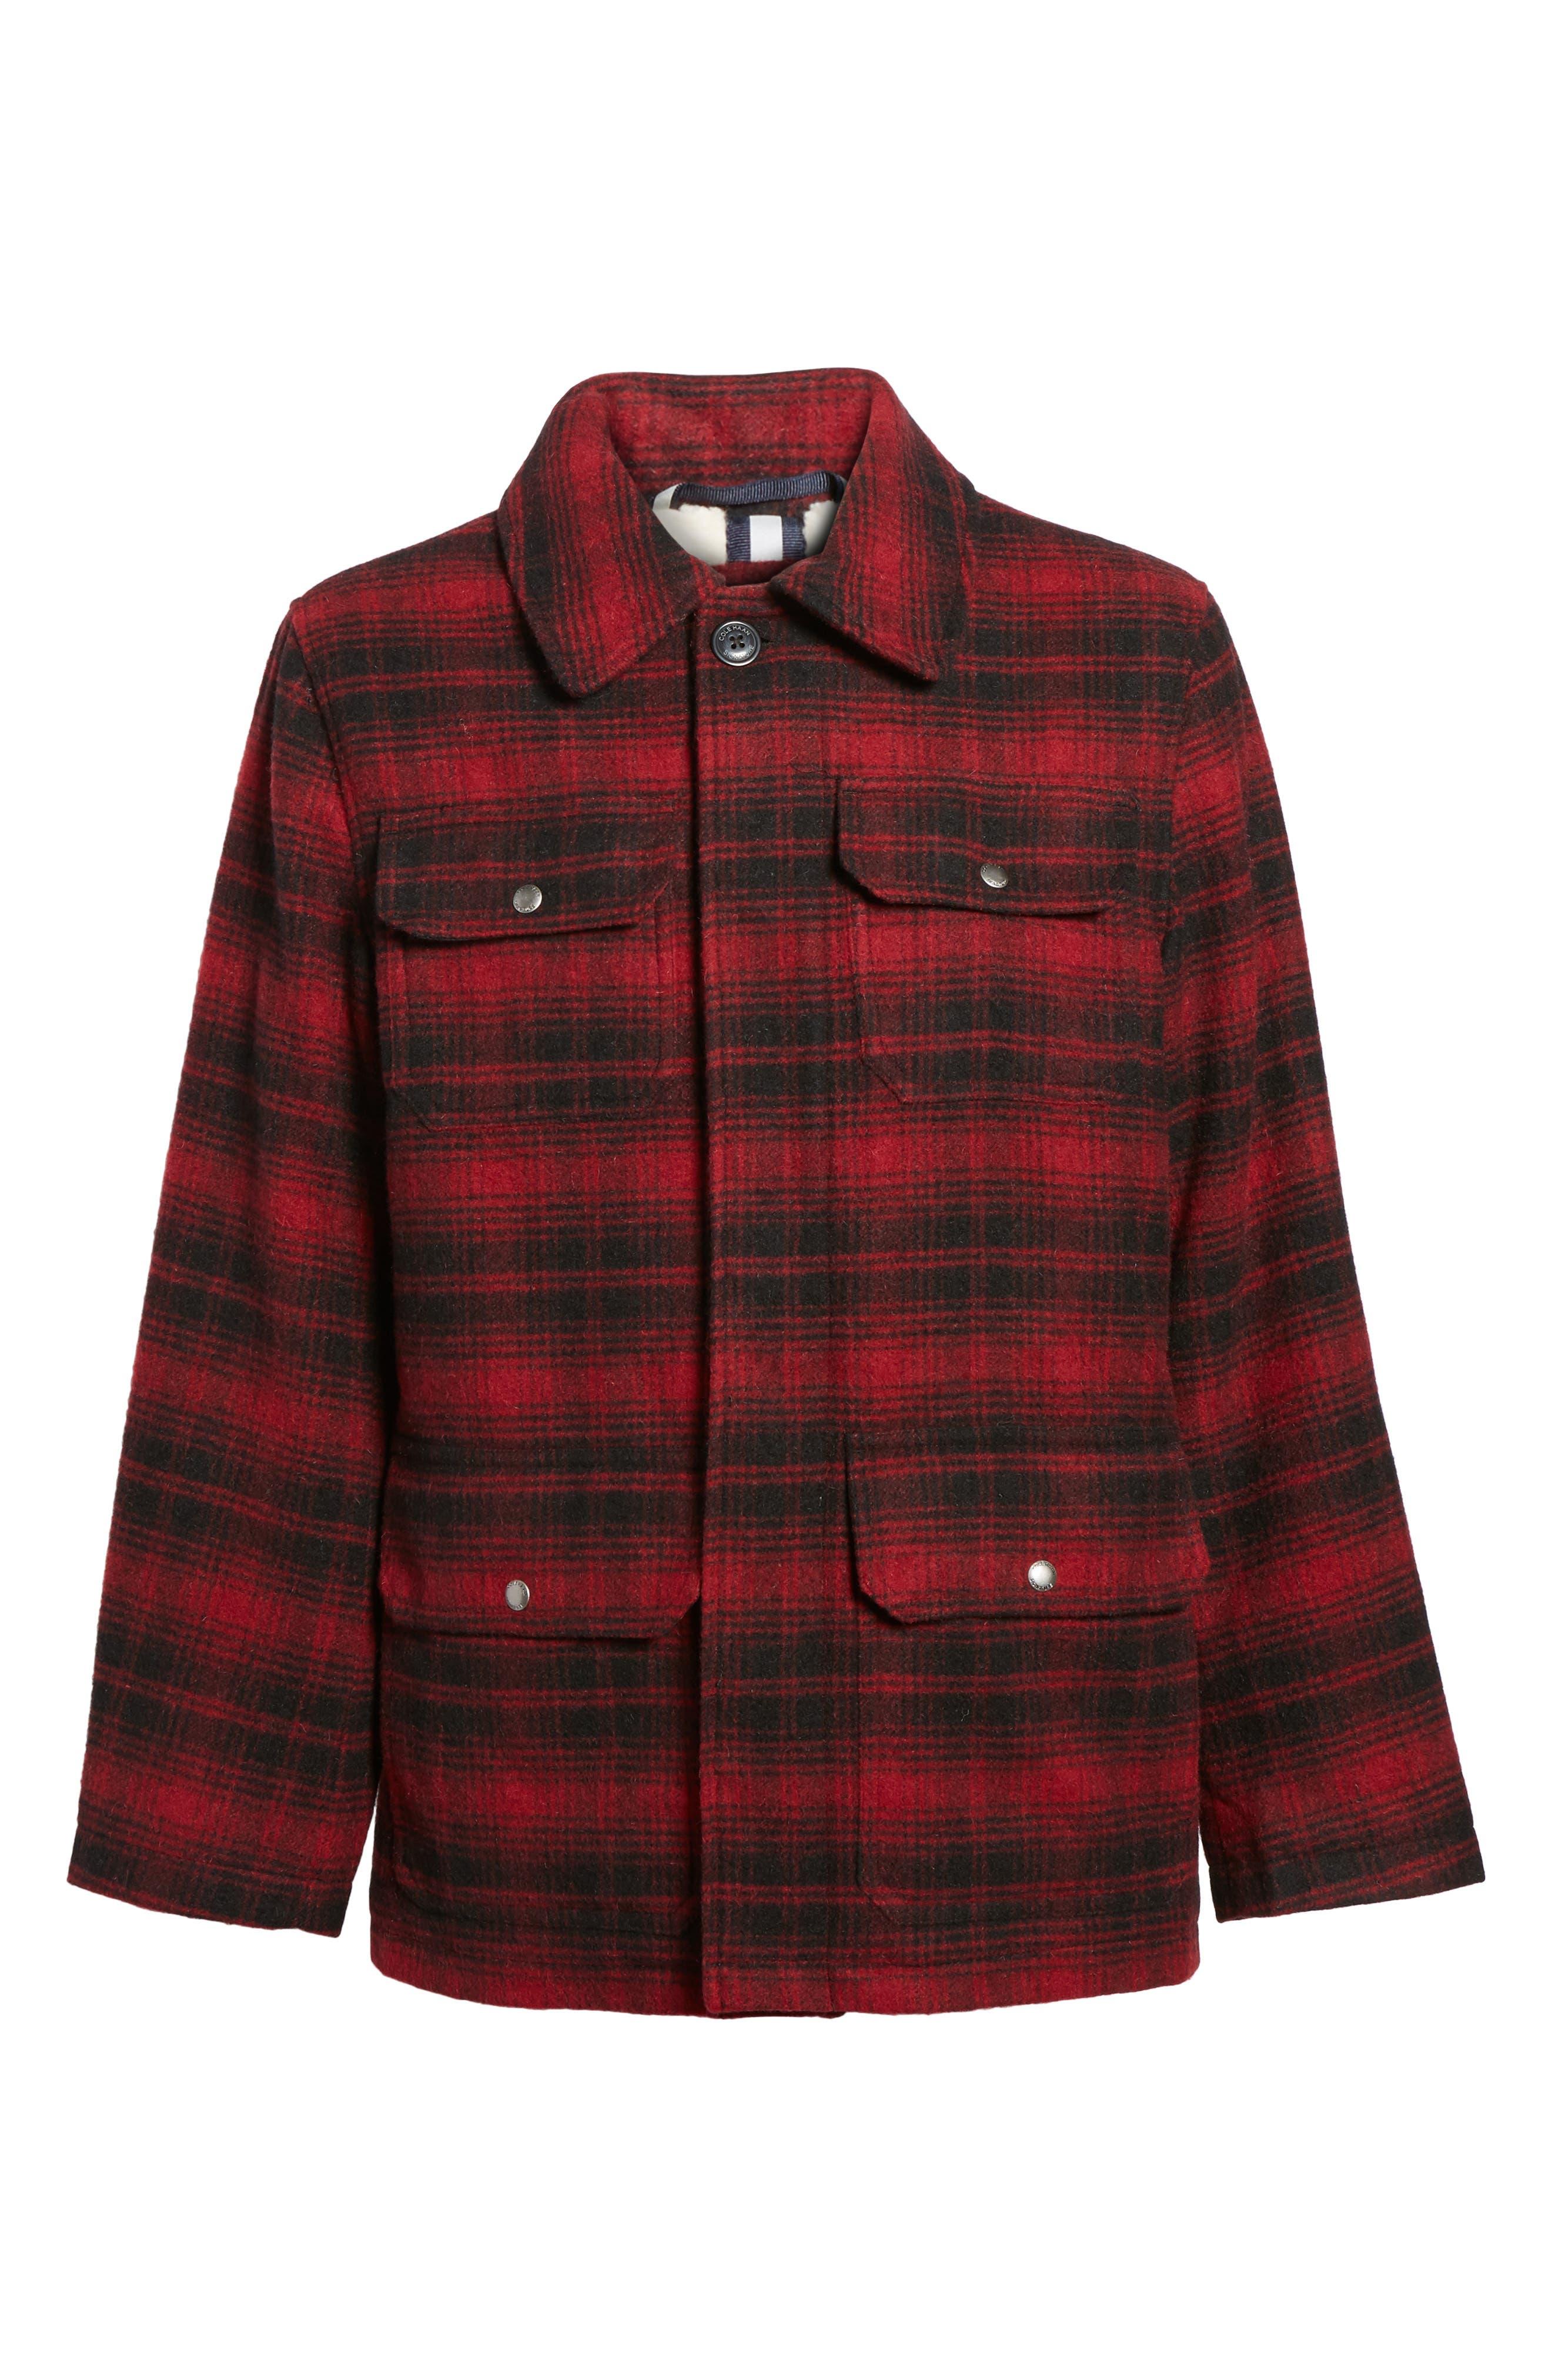 Hunter Jack Wool Blend Shirt Jacket,                             Alternate thumbnail 5, color,                             618